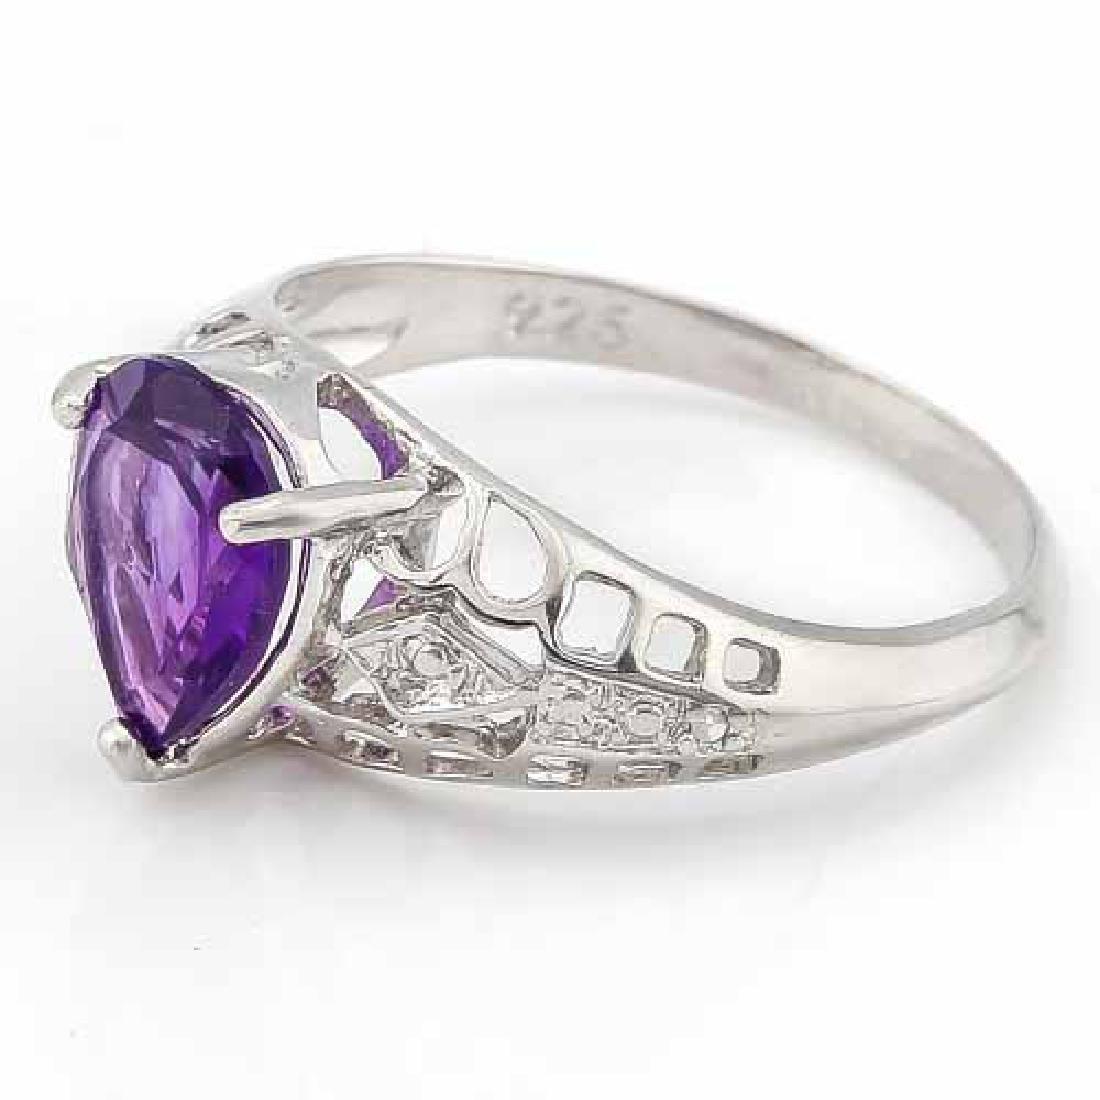 1 CARAT AMETHYST & DIAMOND 925 STERLING SILVER RING